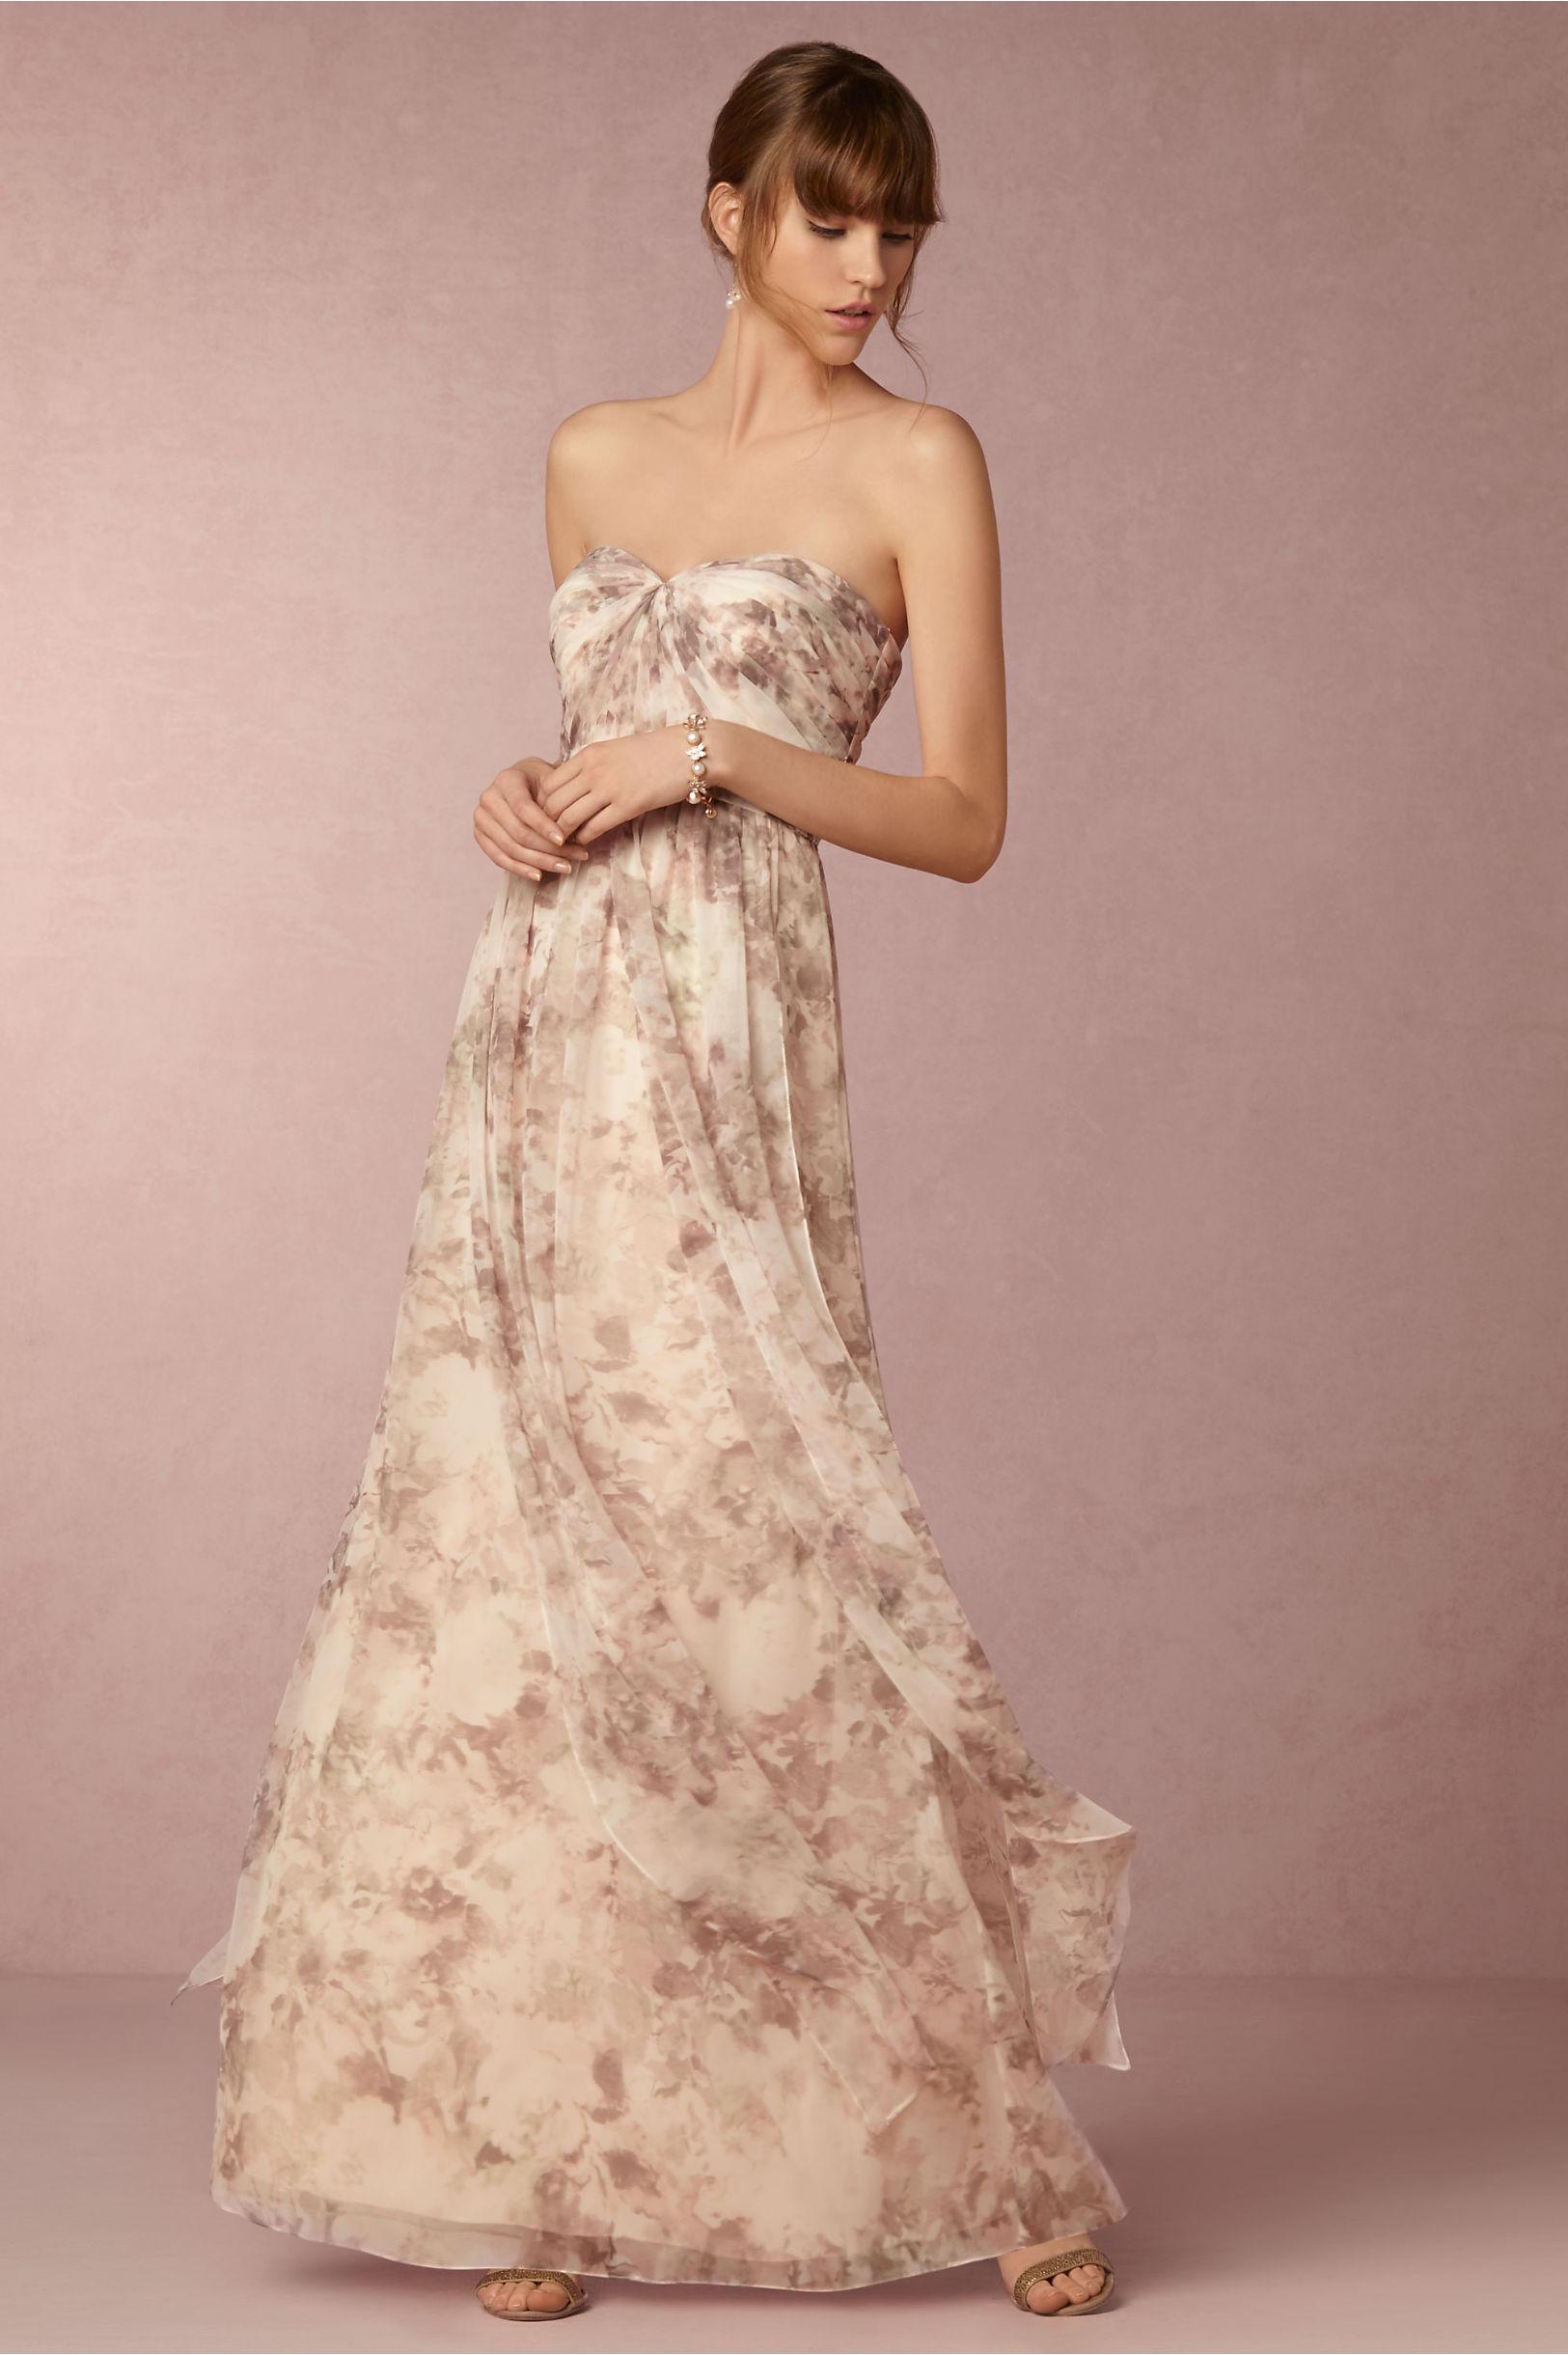 Nyla Dress in Bridesmaids & Bridal Party | BHLDN